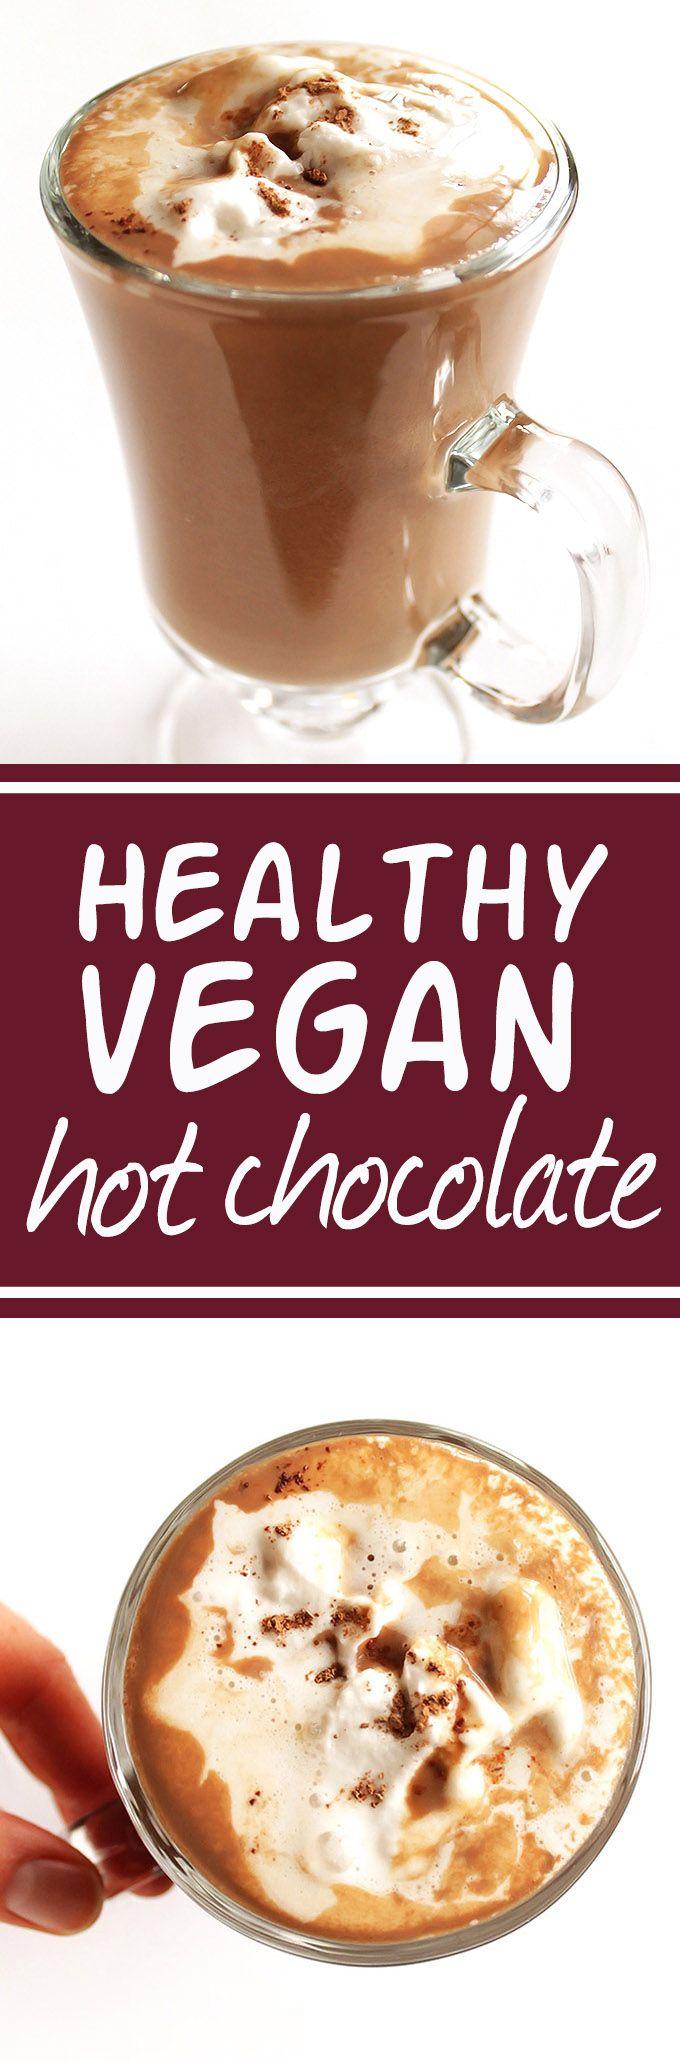 Healthy Vegan Hot Chocolate Recipe Vegan hot chocolate